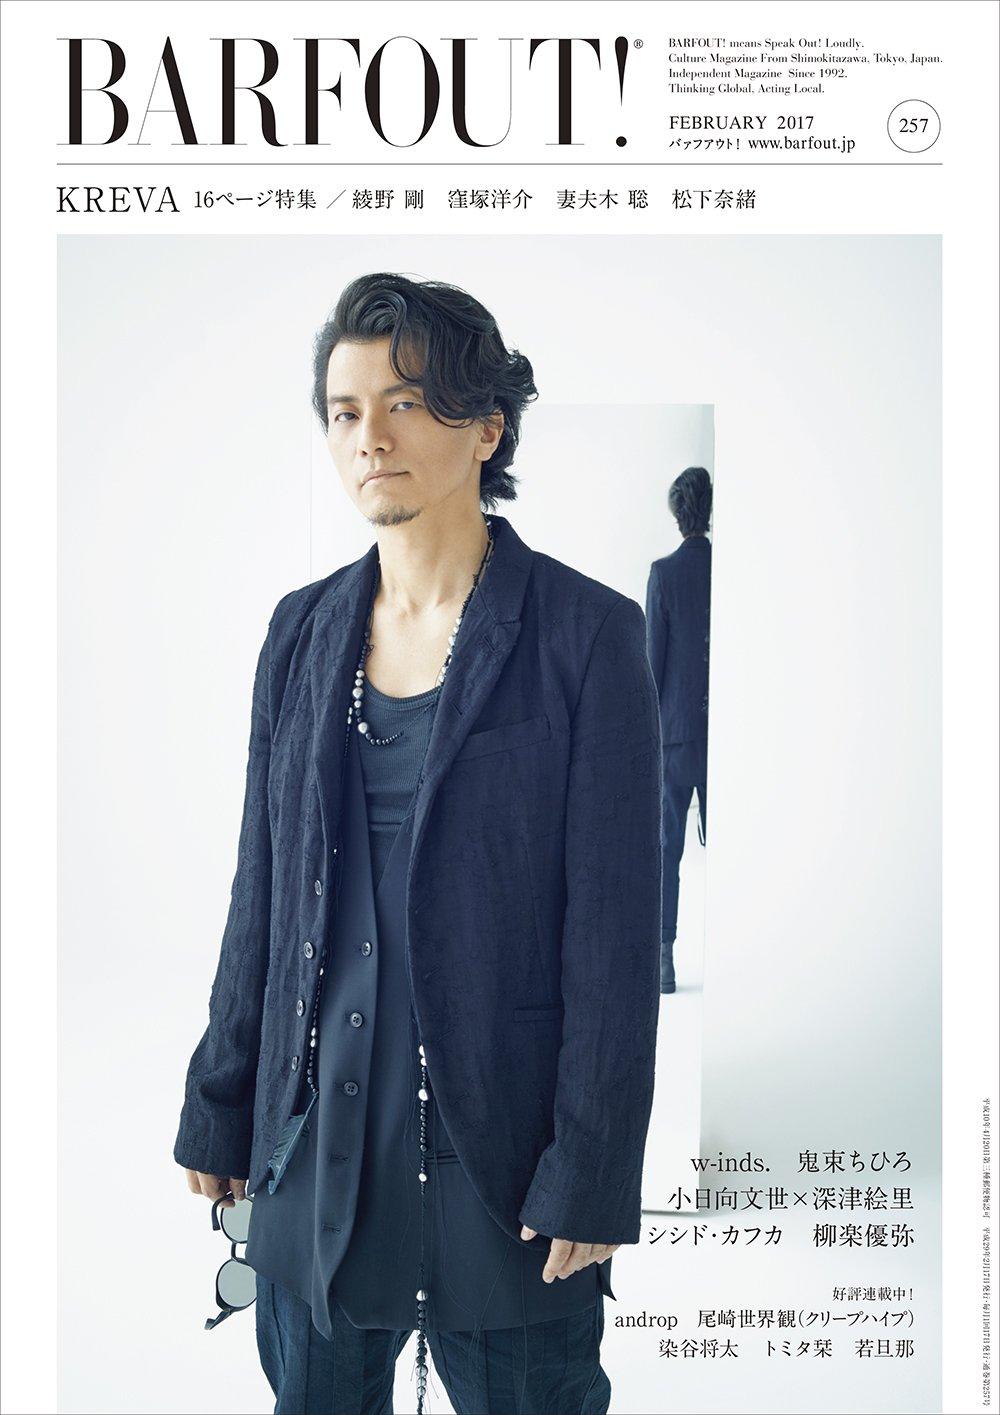 FEBRUARY 2017 VOLUME 257